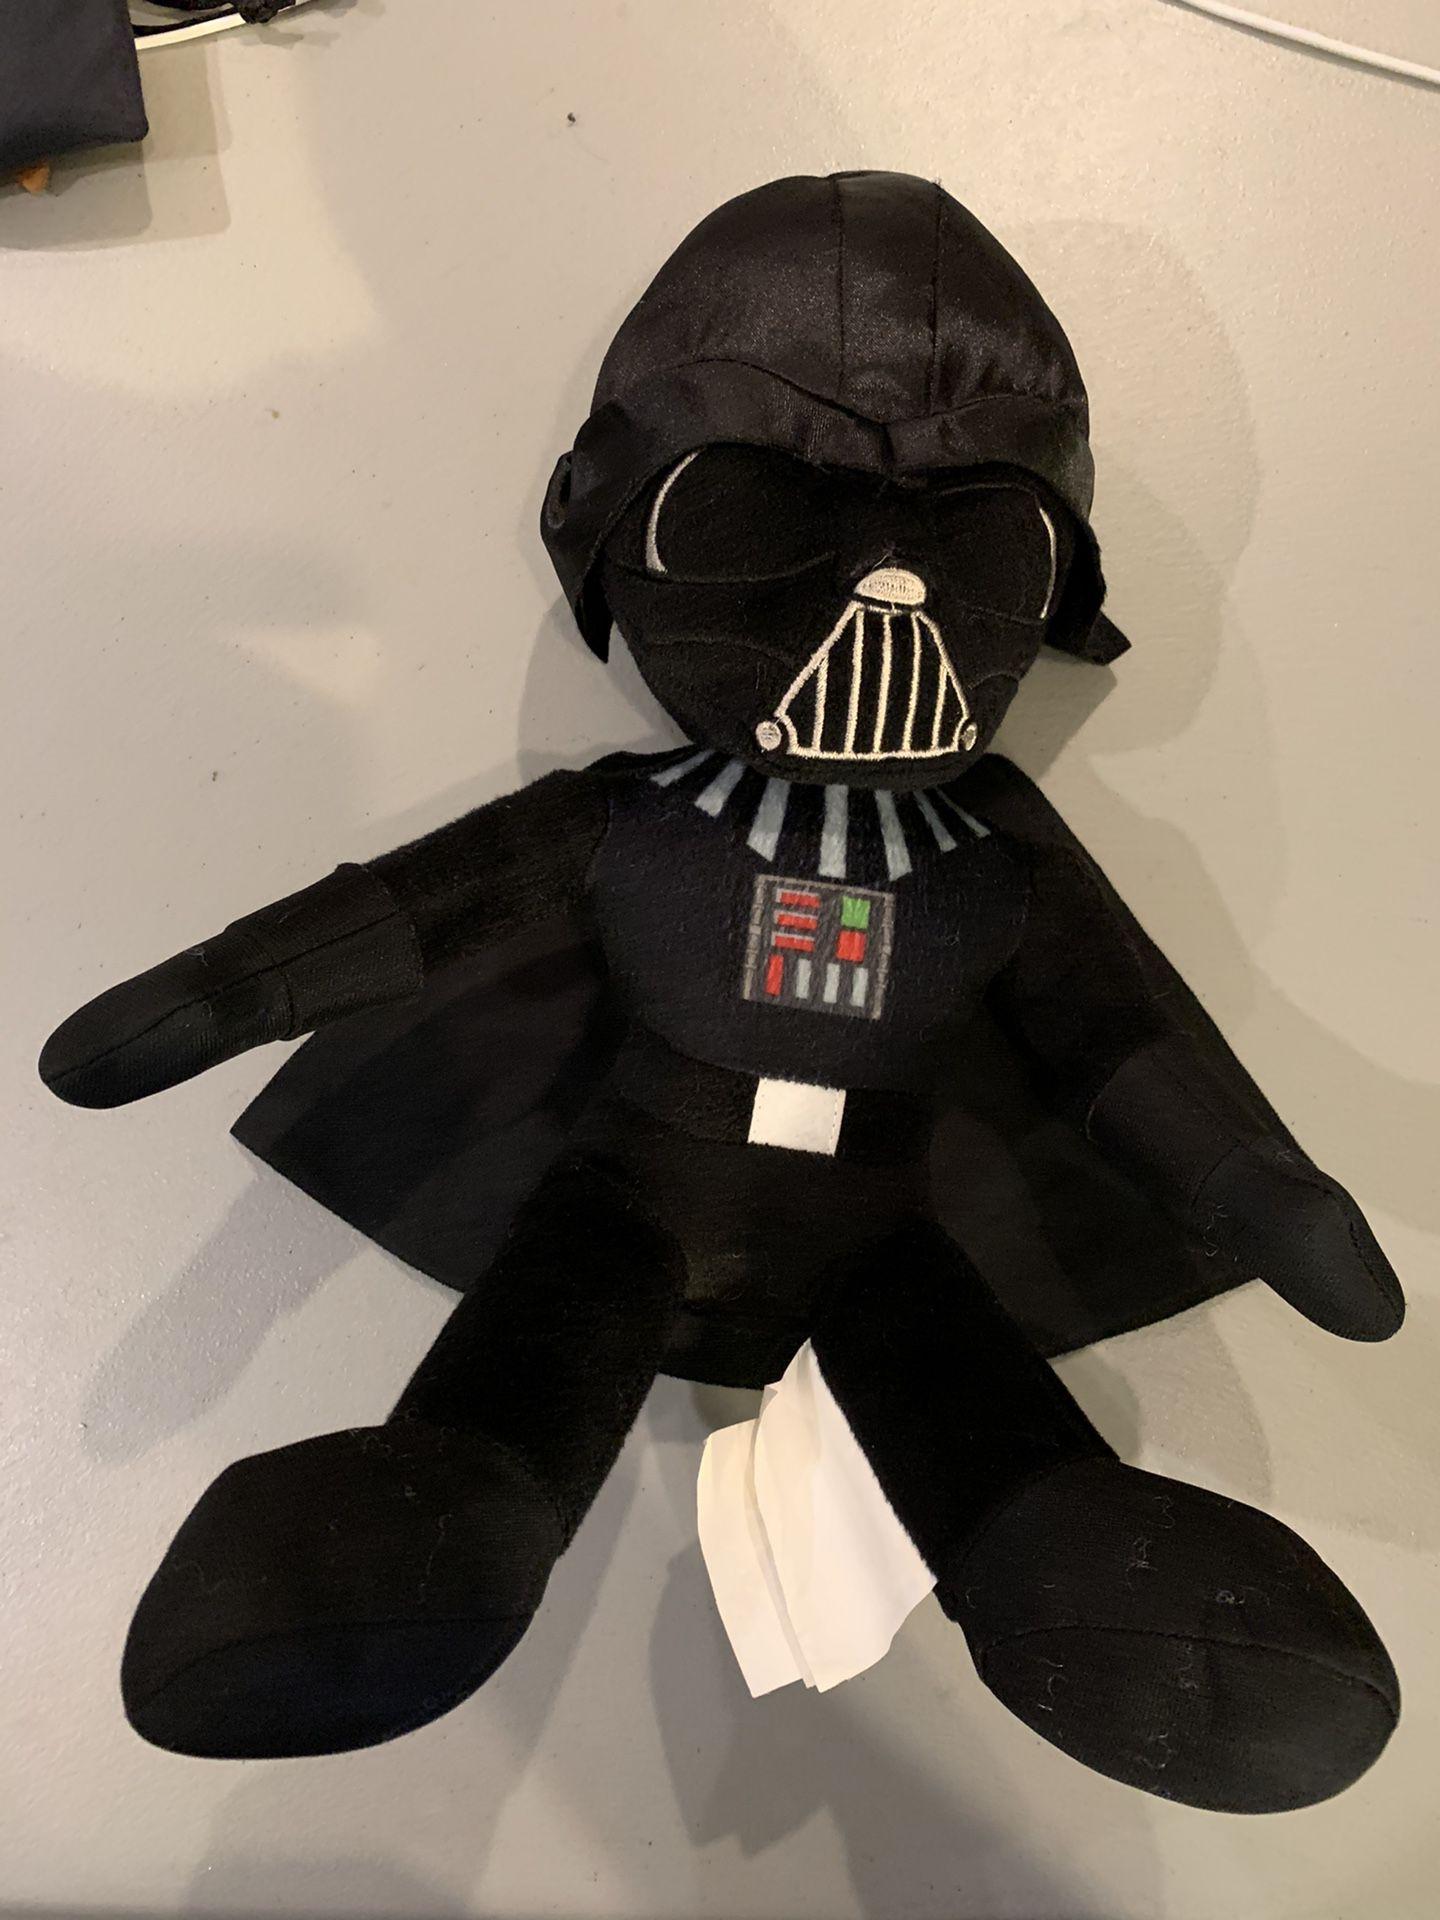 """Star Wars Darth Vader 15"""" Plush Stuffed Toy"""